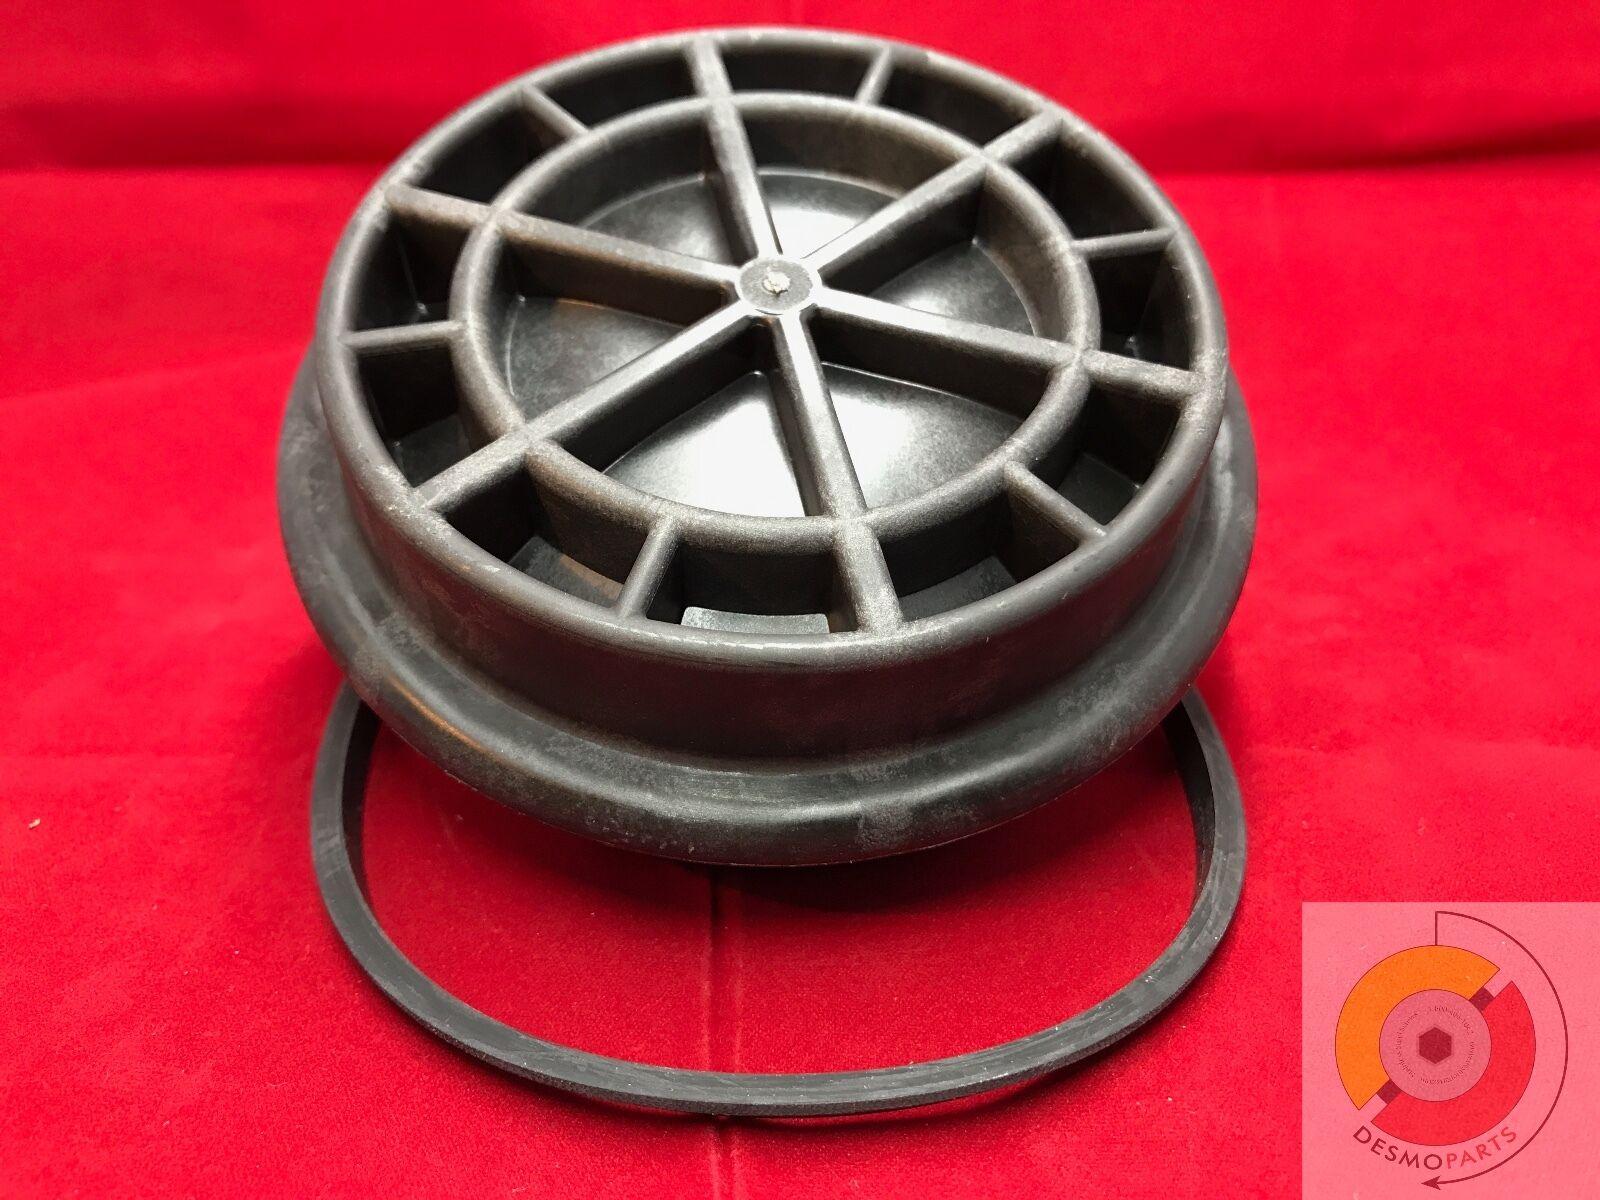 kd 3526 fuel filter tool for ford 7.3 l usa for sale online | ebay  ebay